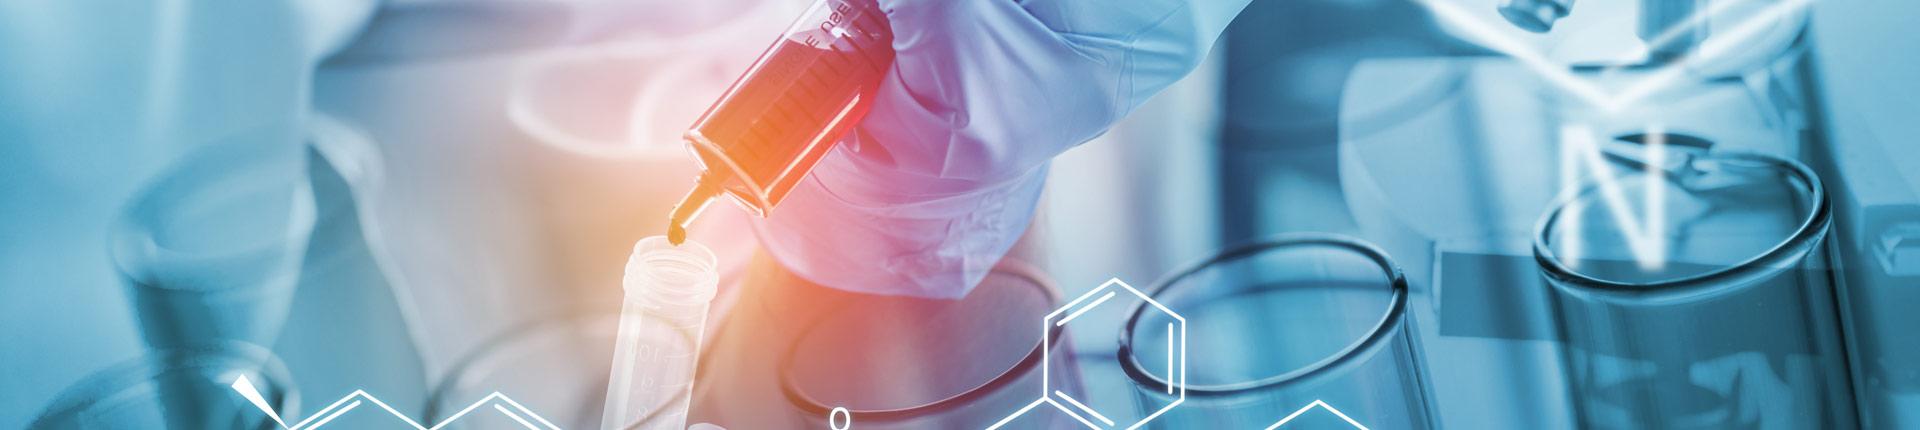 Metanabol, oral-turinabol a ukrwienie serca